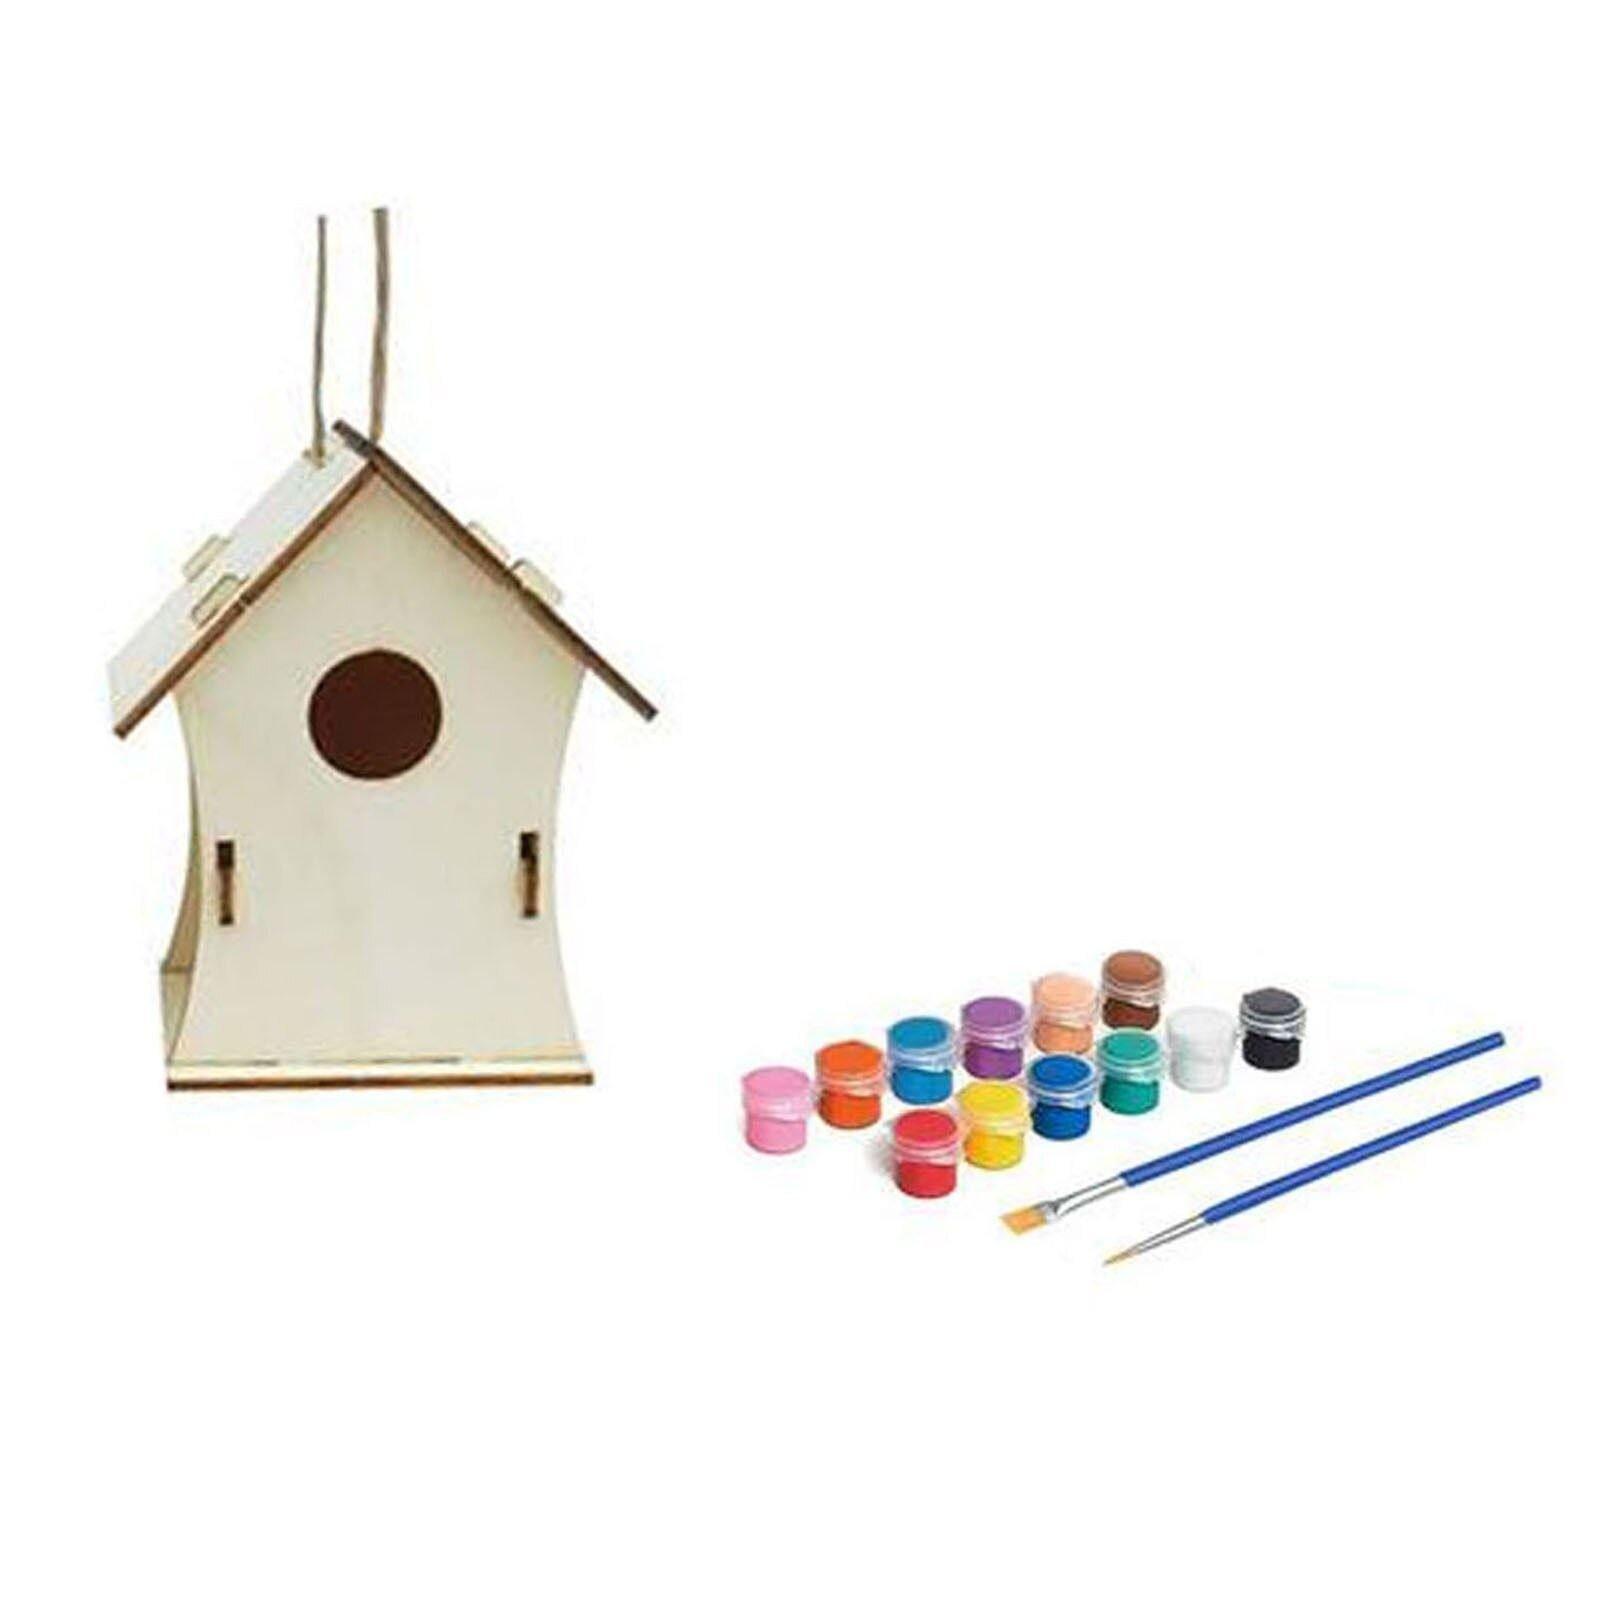 Photo of Creative Wooden Home Decoration Diy Hand Painted Crafts Graffiti Bird House Set 30ml Bird House Diy Home Garden Pet Supplier – G / SPAIN